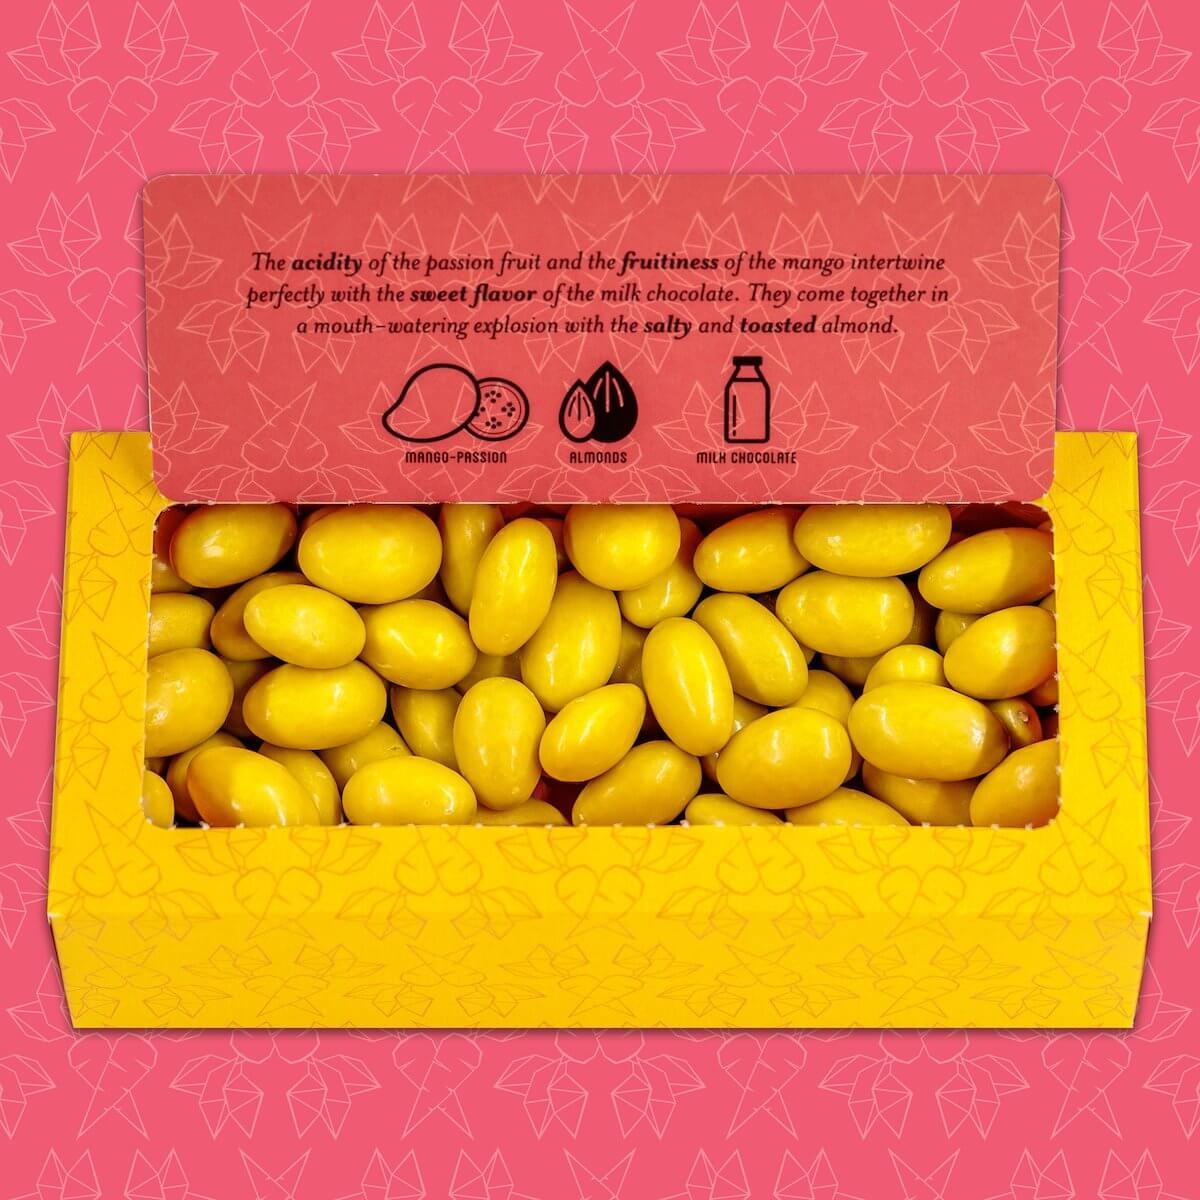 Omnom Mr Carrots Almond Box inside